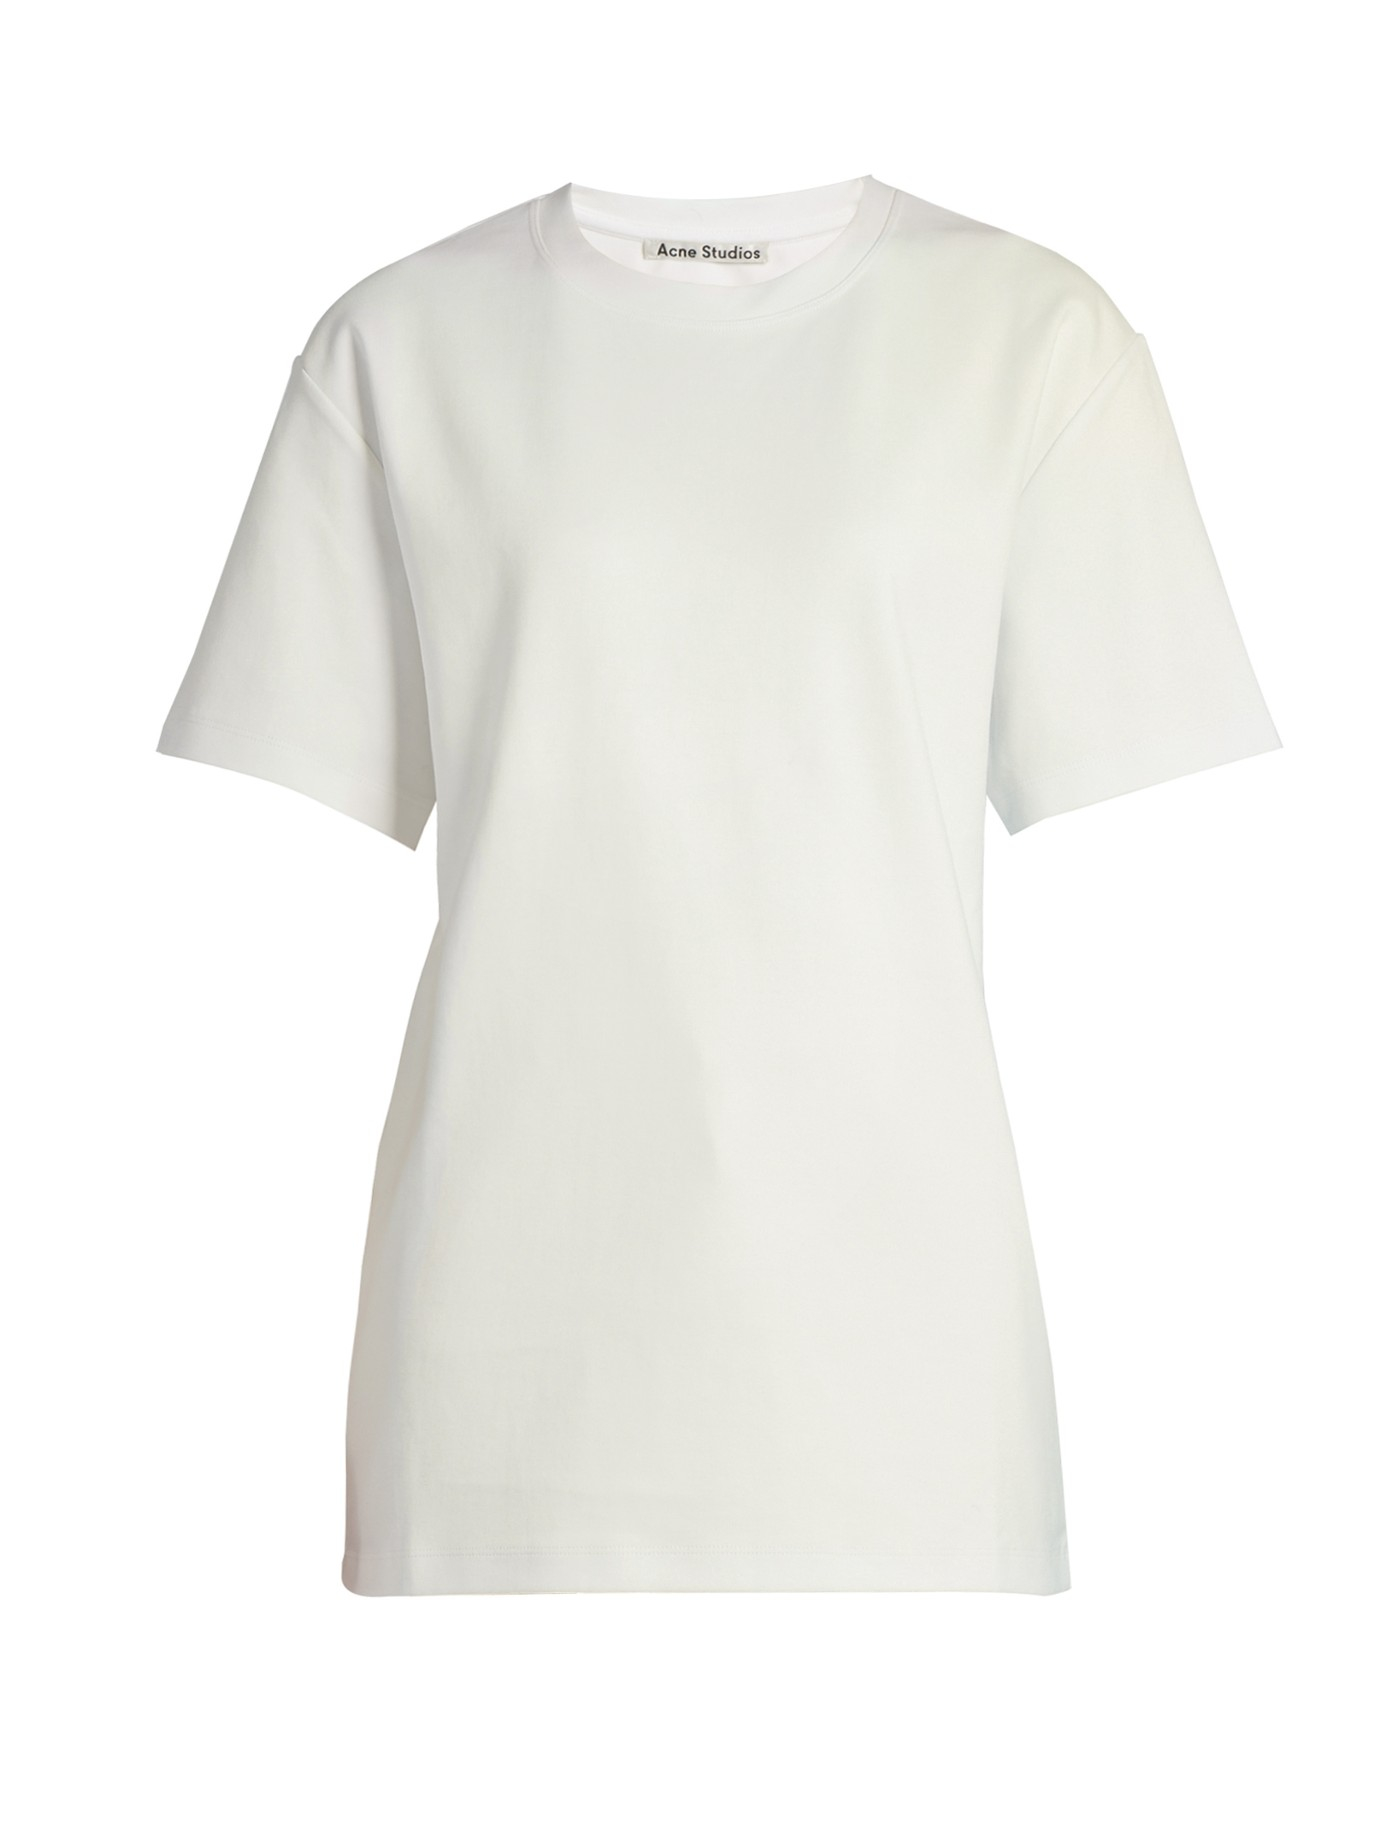 Lyst Acne Studios Enya Short Sleeved Cotton T Shirt